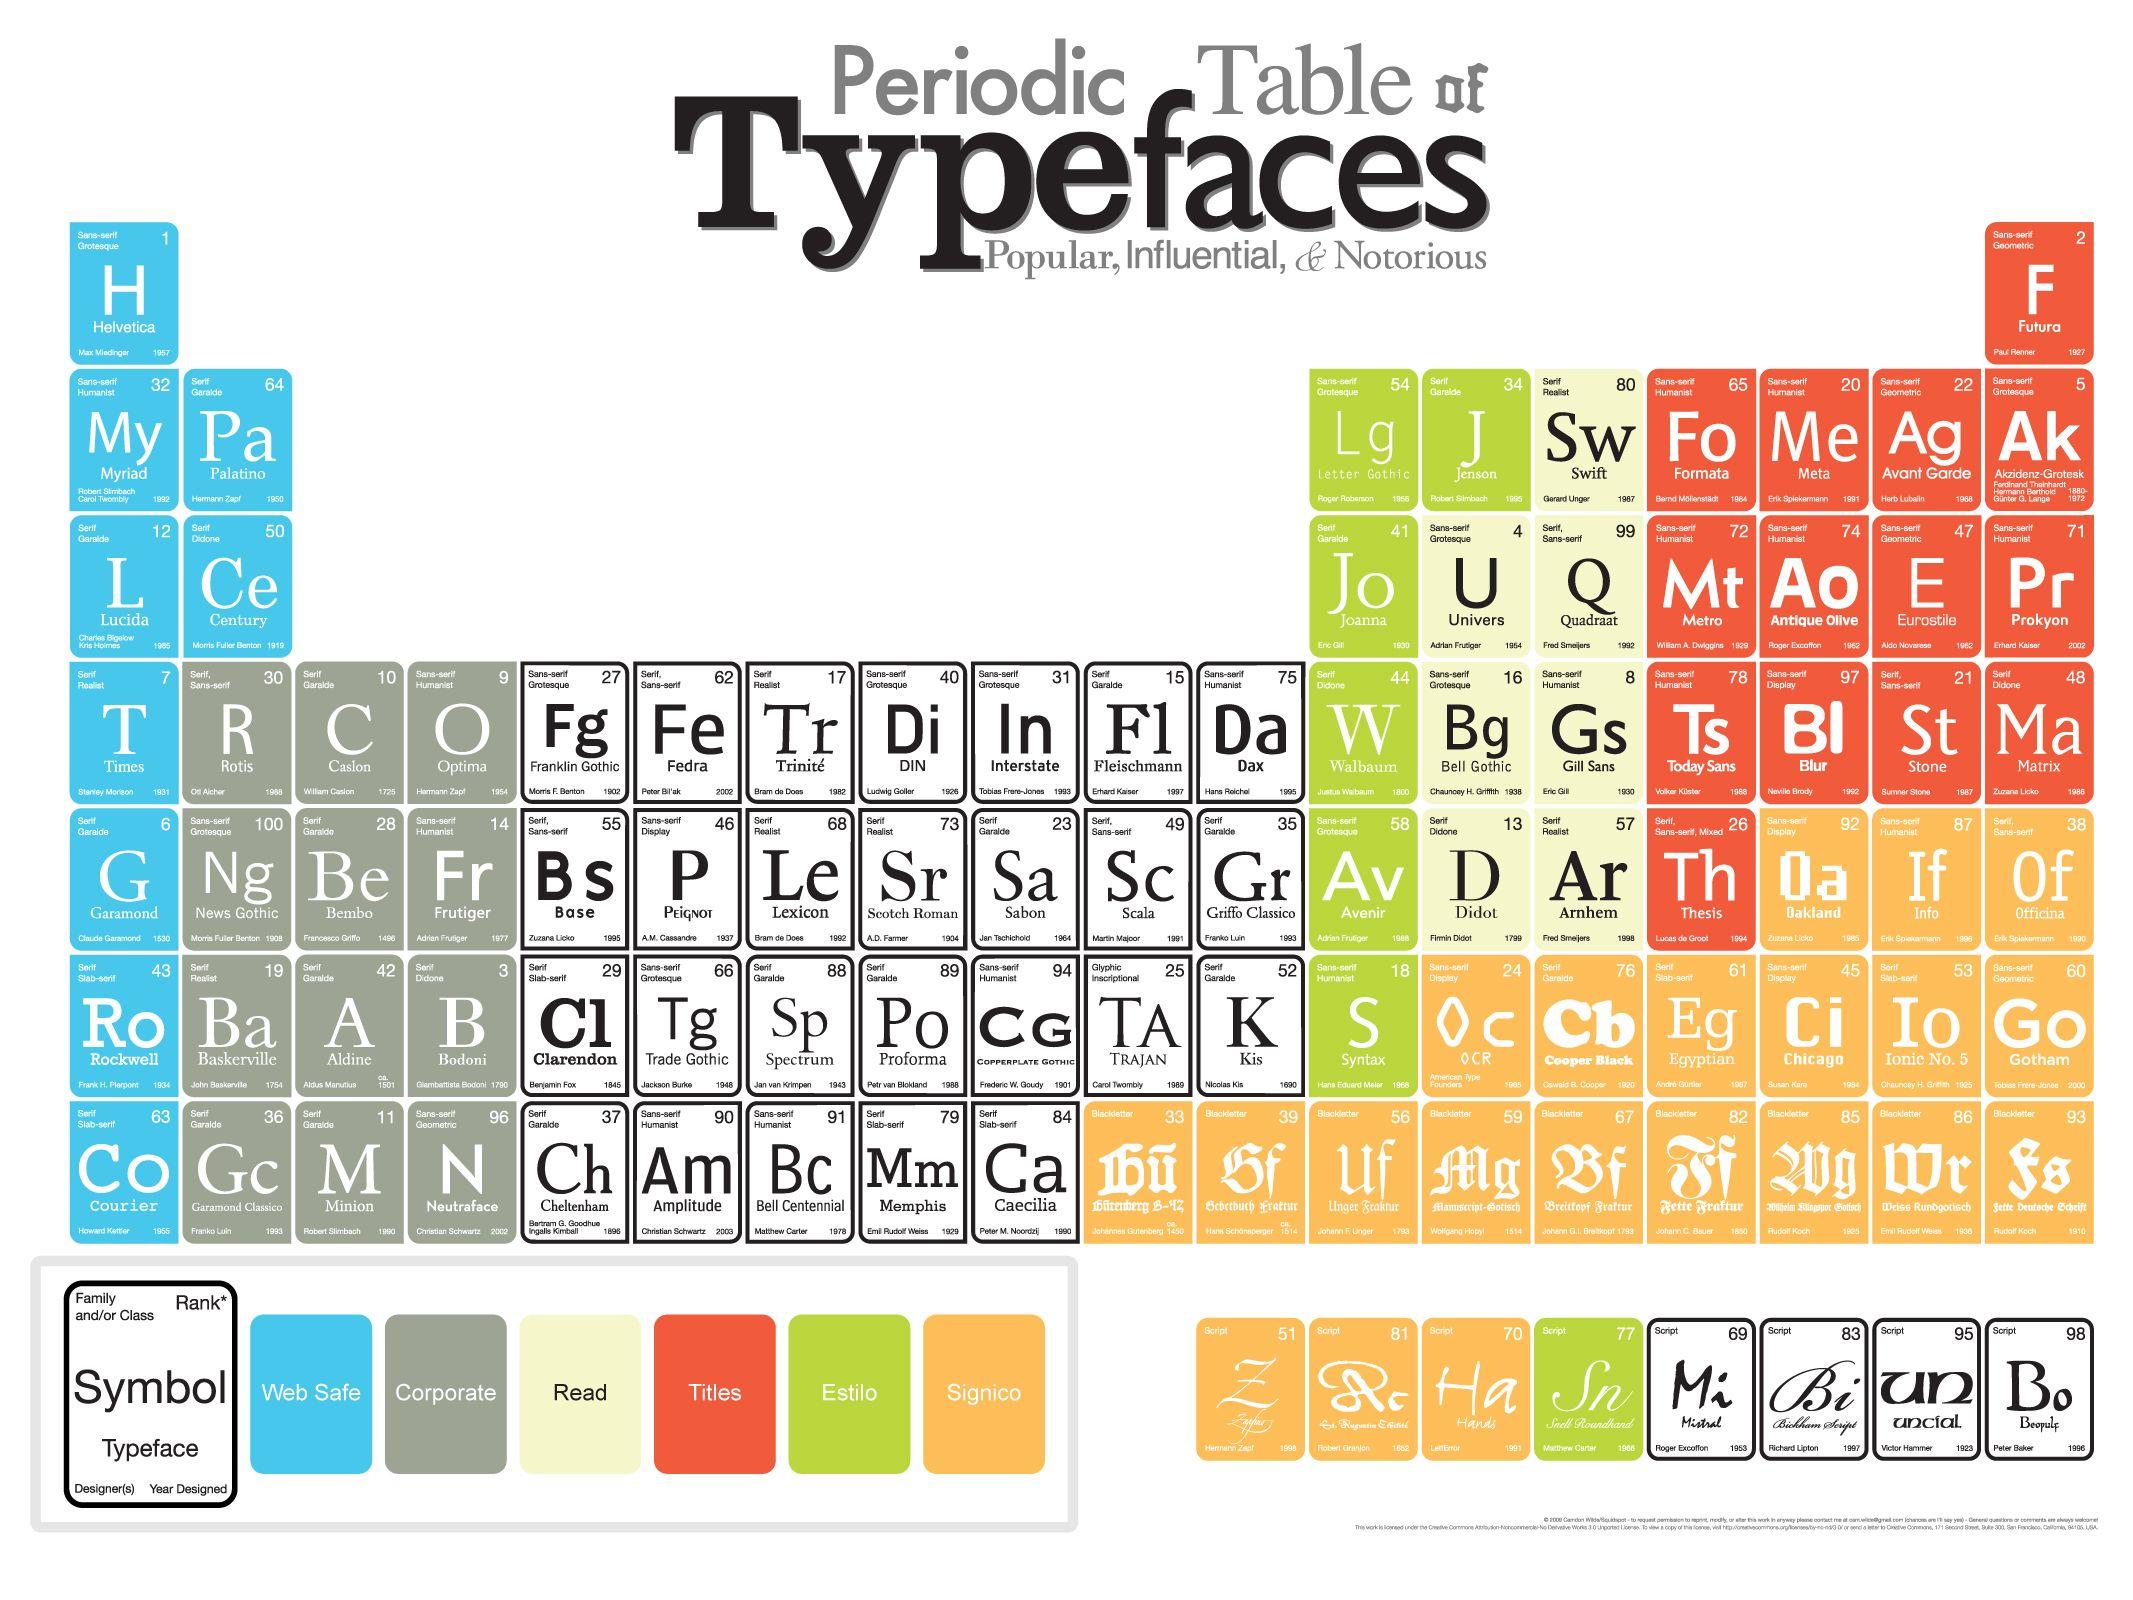 Tipografias para periodicos buscar con google peridico periodic table of typefaces bespoke social media marketing gamestrikefo Images